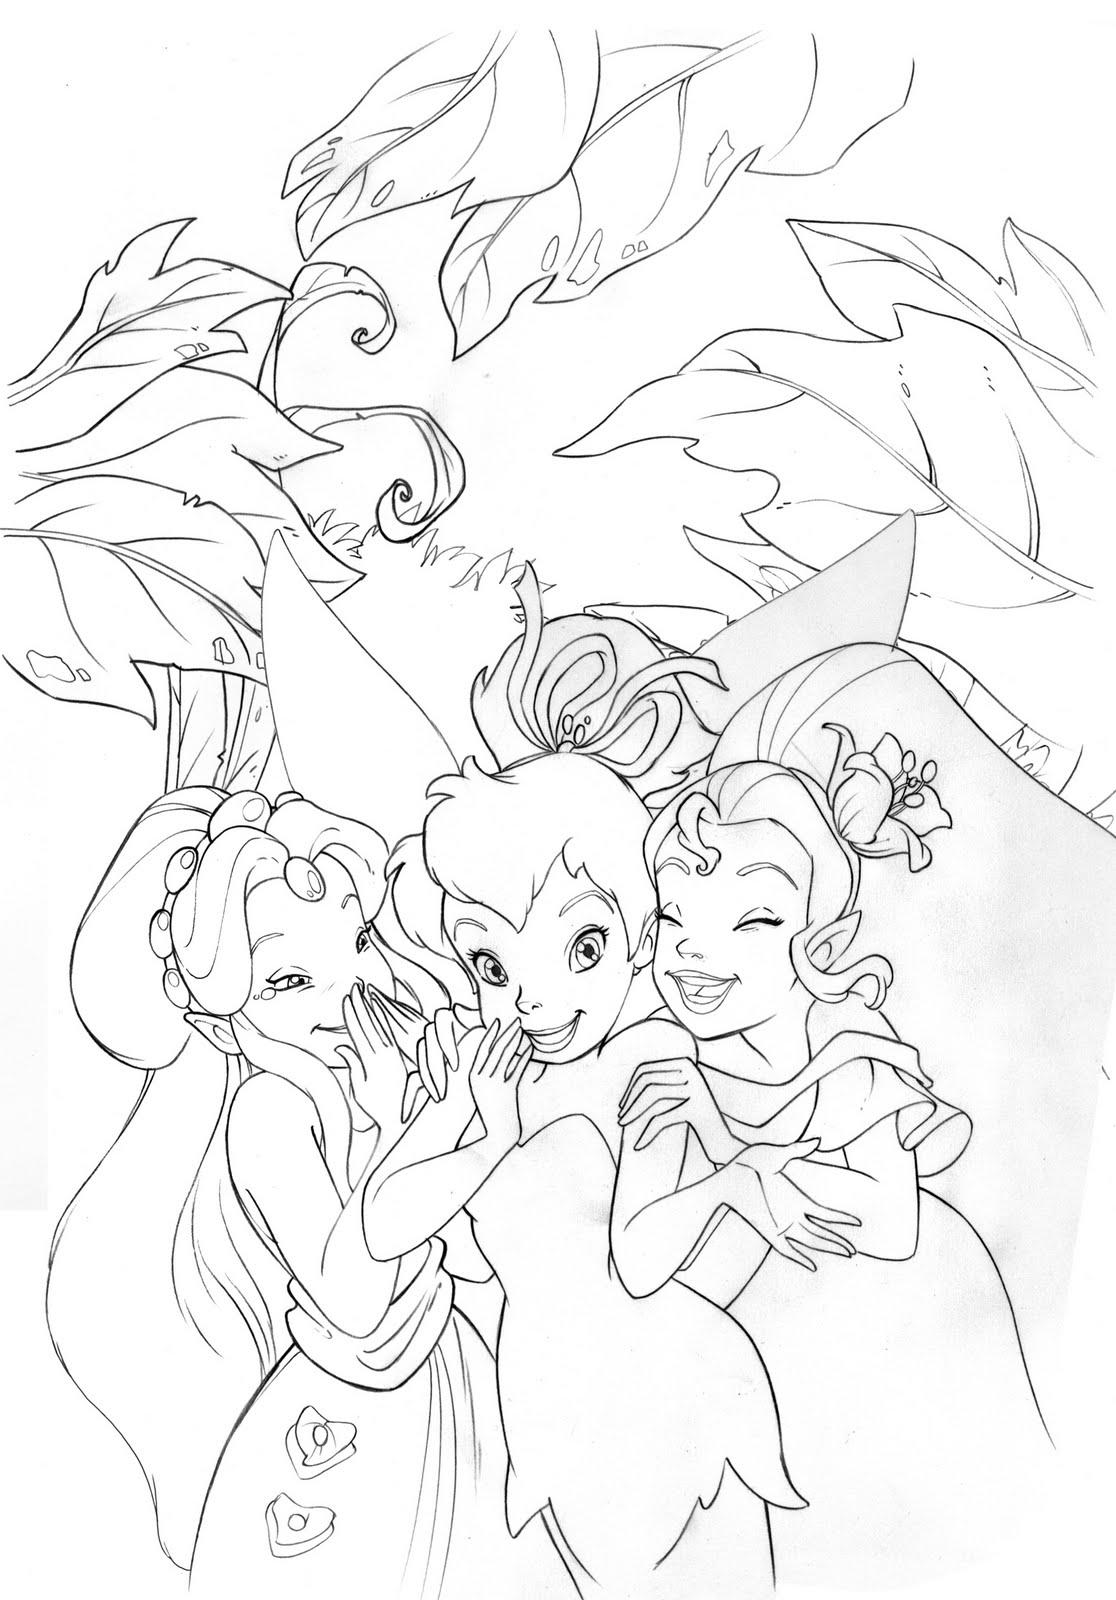 Kleurplaten Disney Fairies.Disney Fairies Kleurplaten Archidev